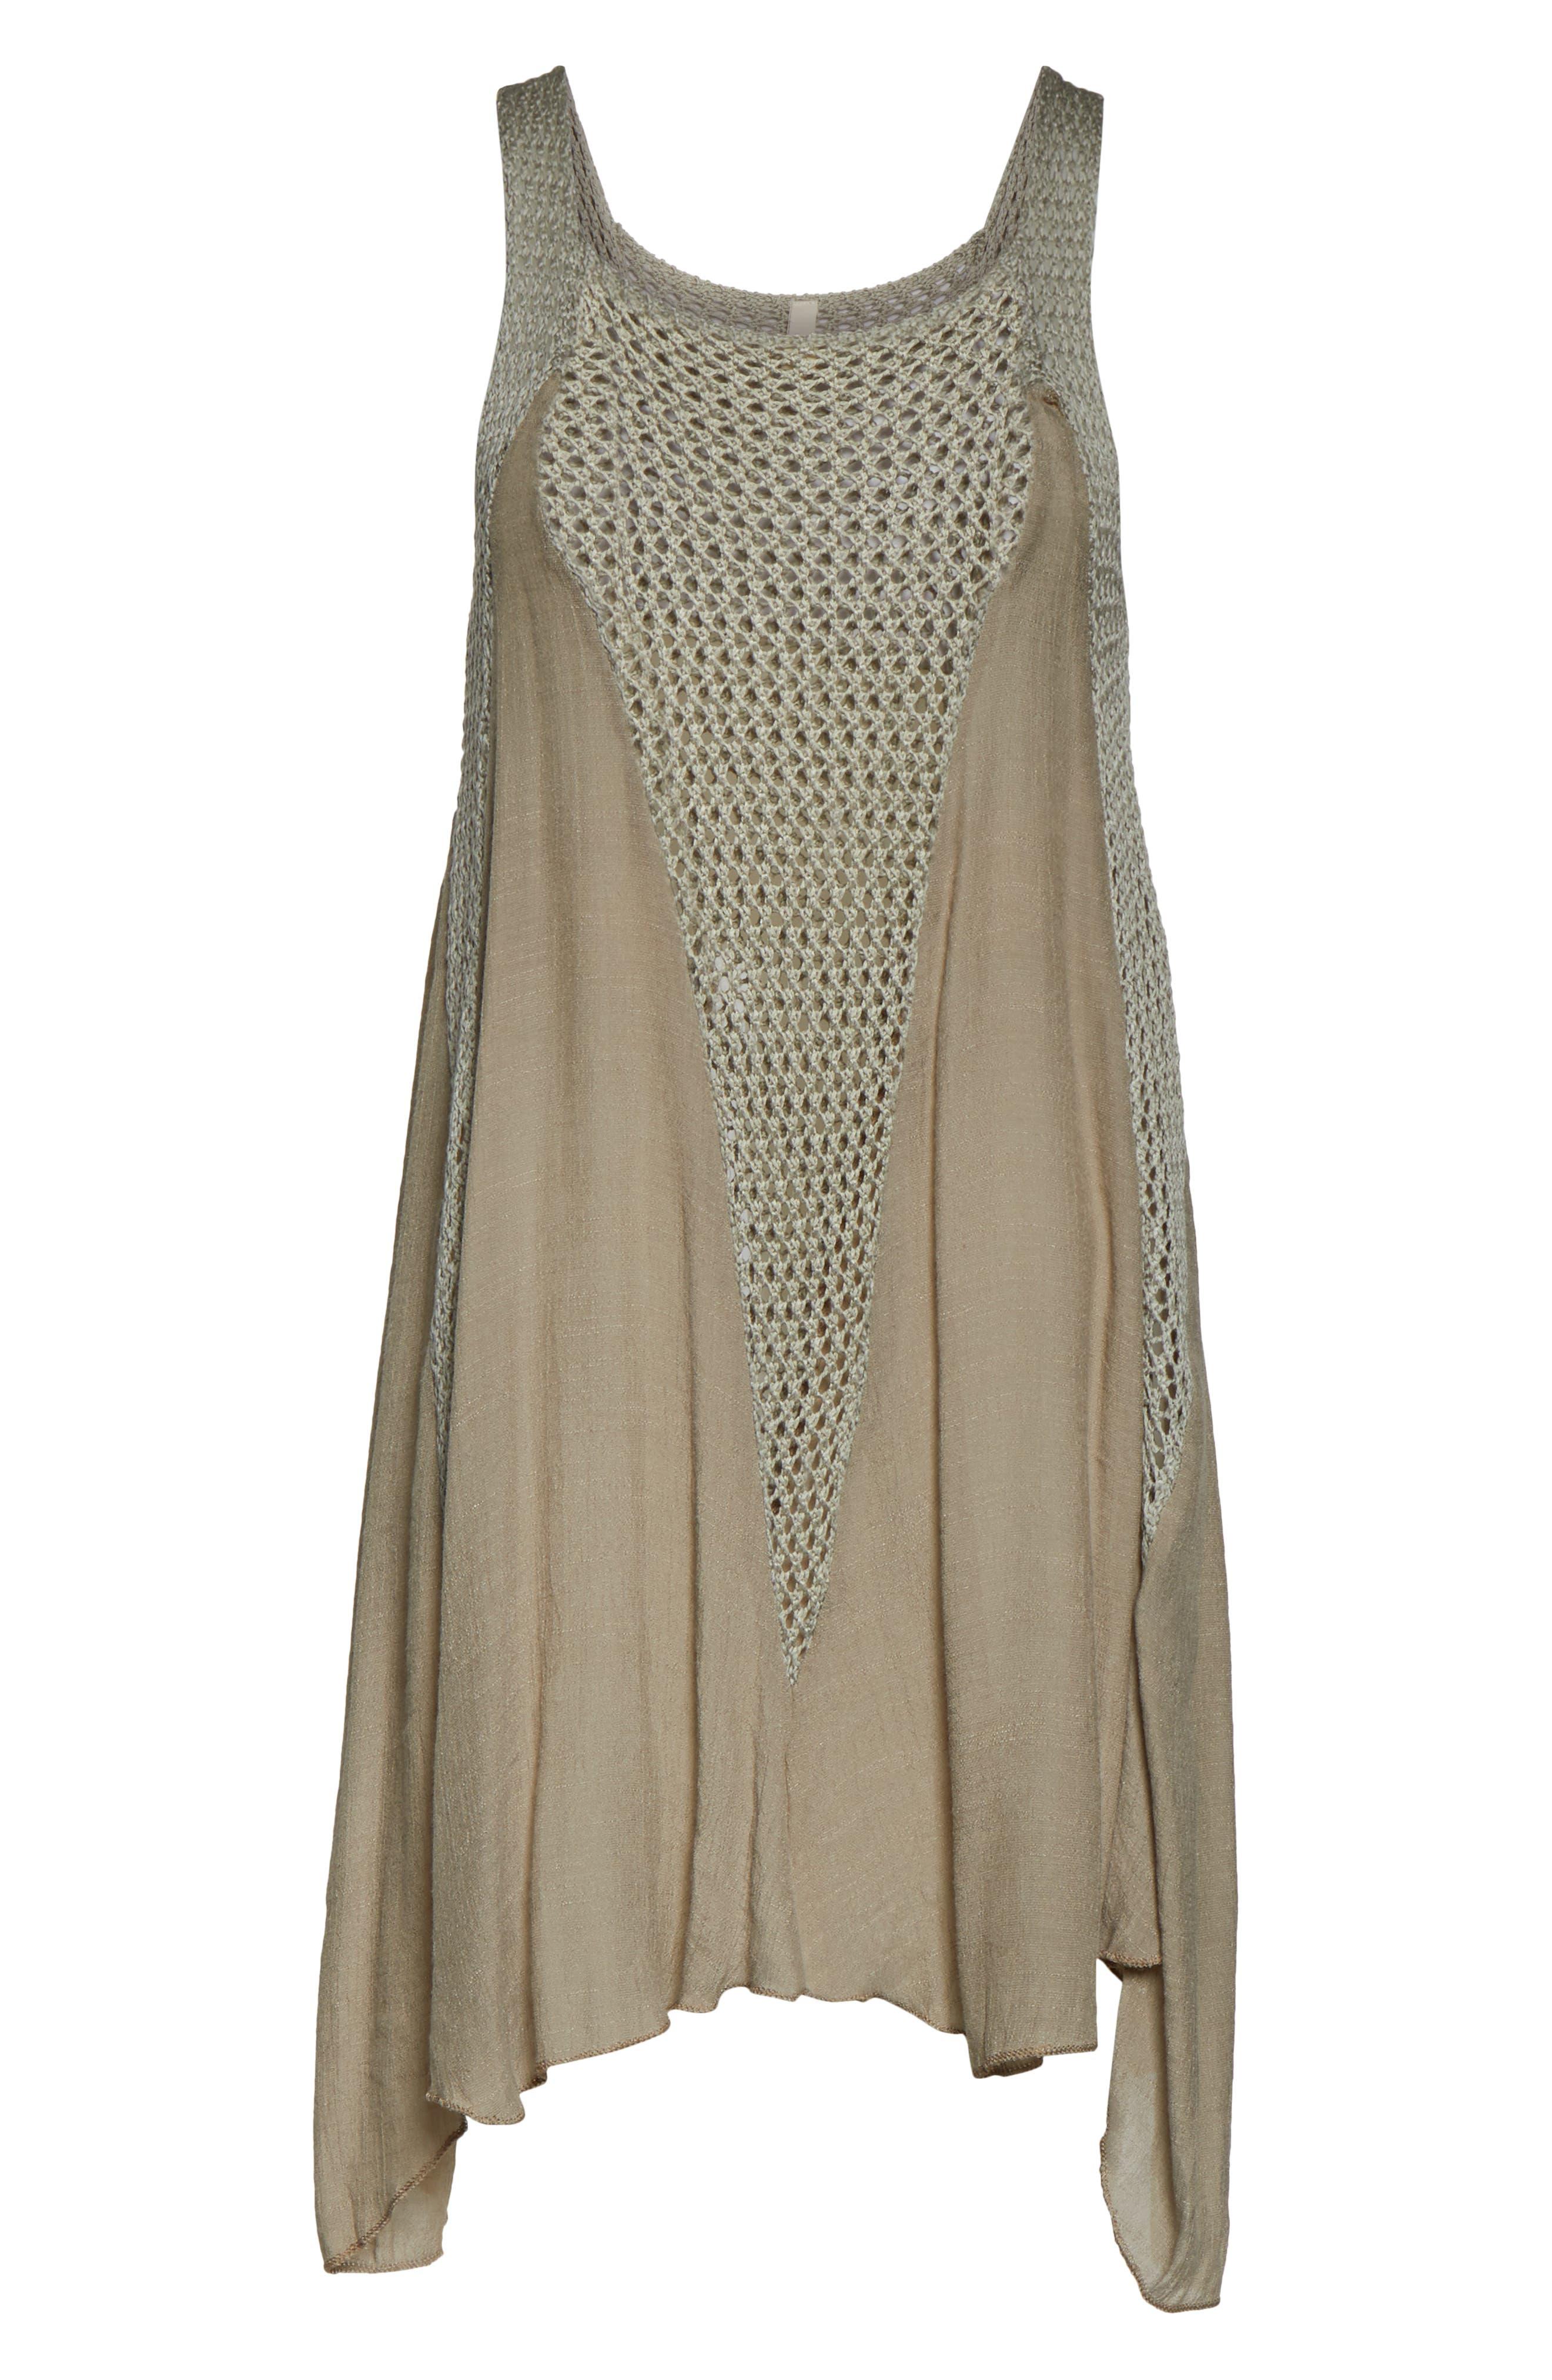 ELAN, Crochet Inset Cover-Up Dress, Alternate thumbnail 7, color, SAGE